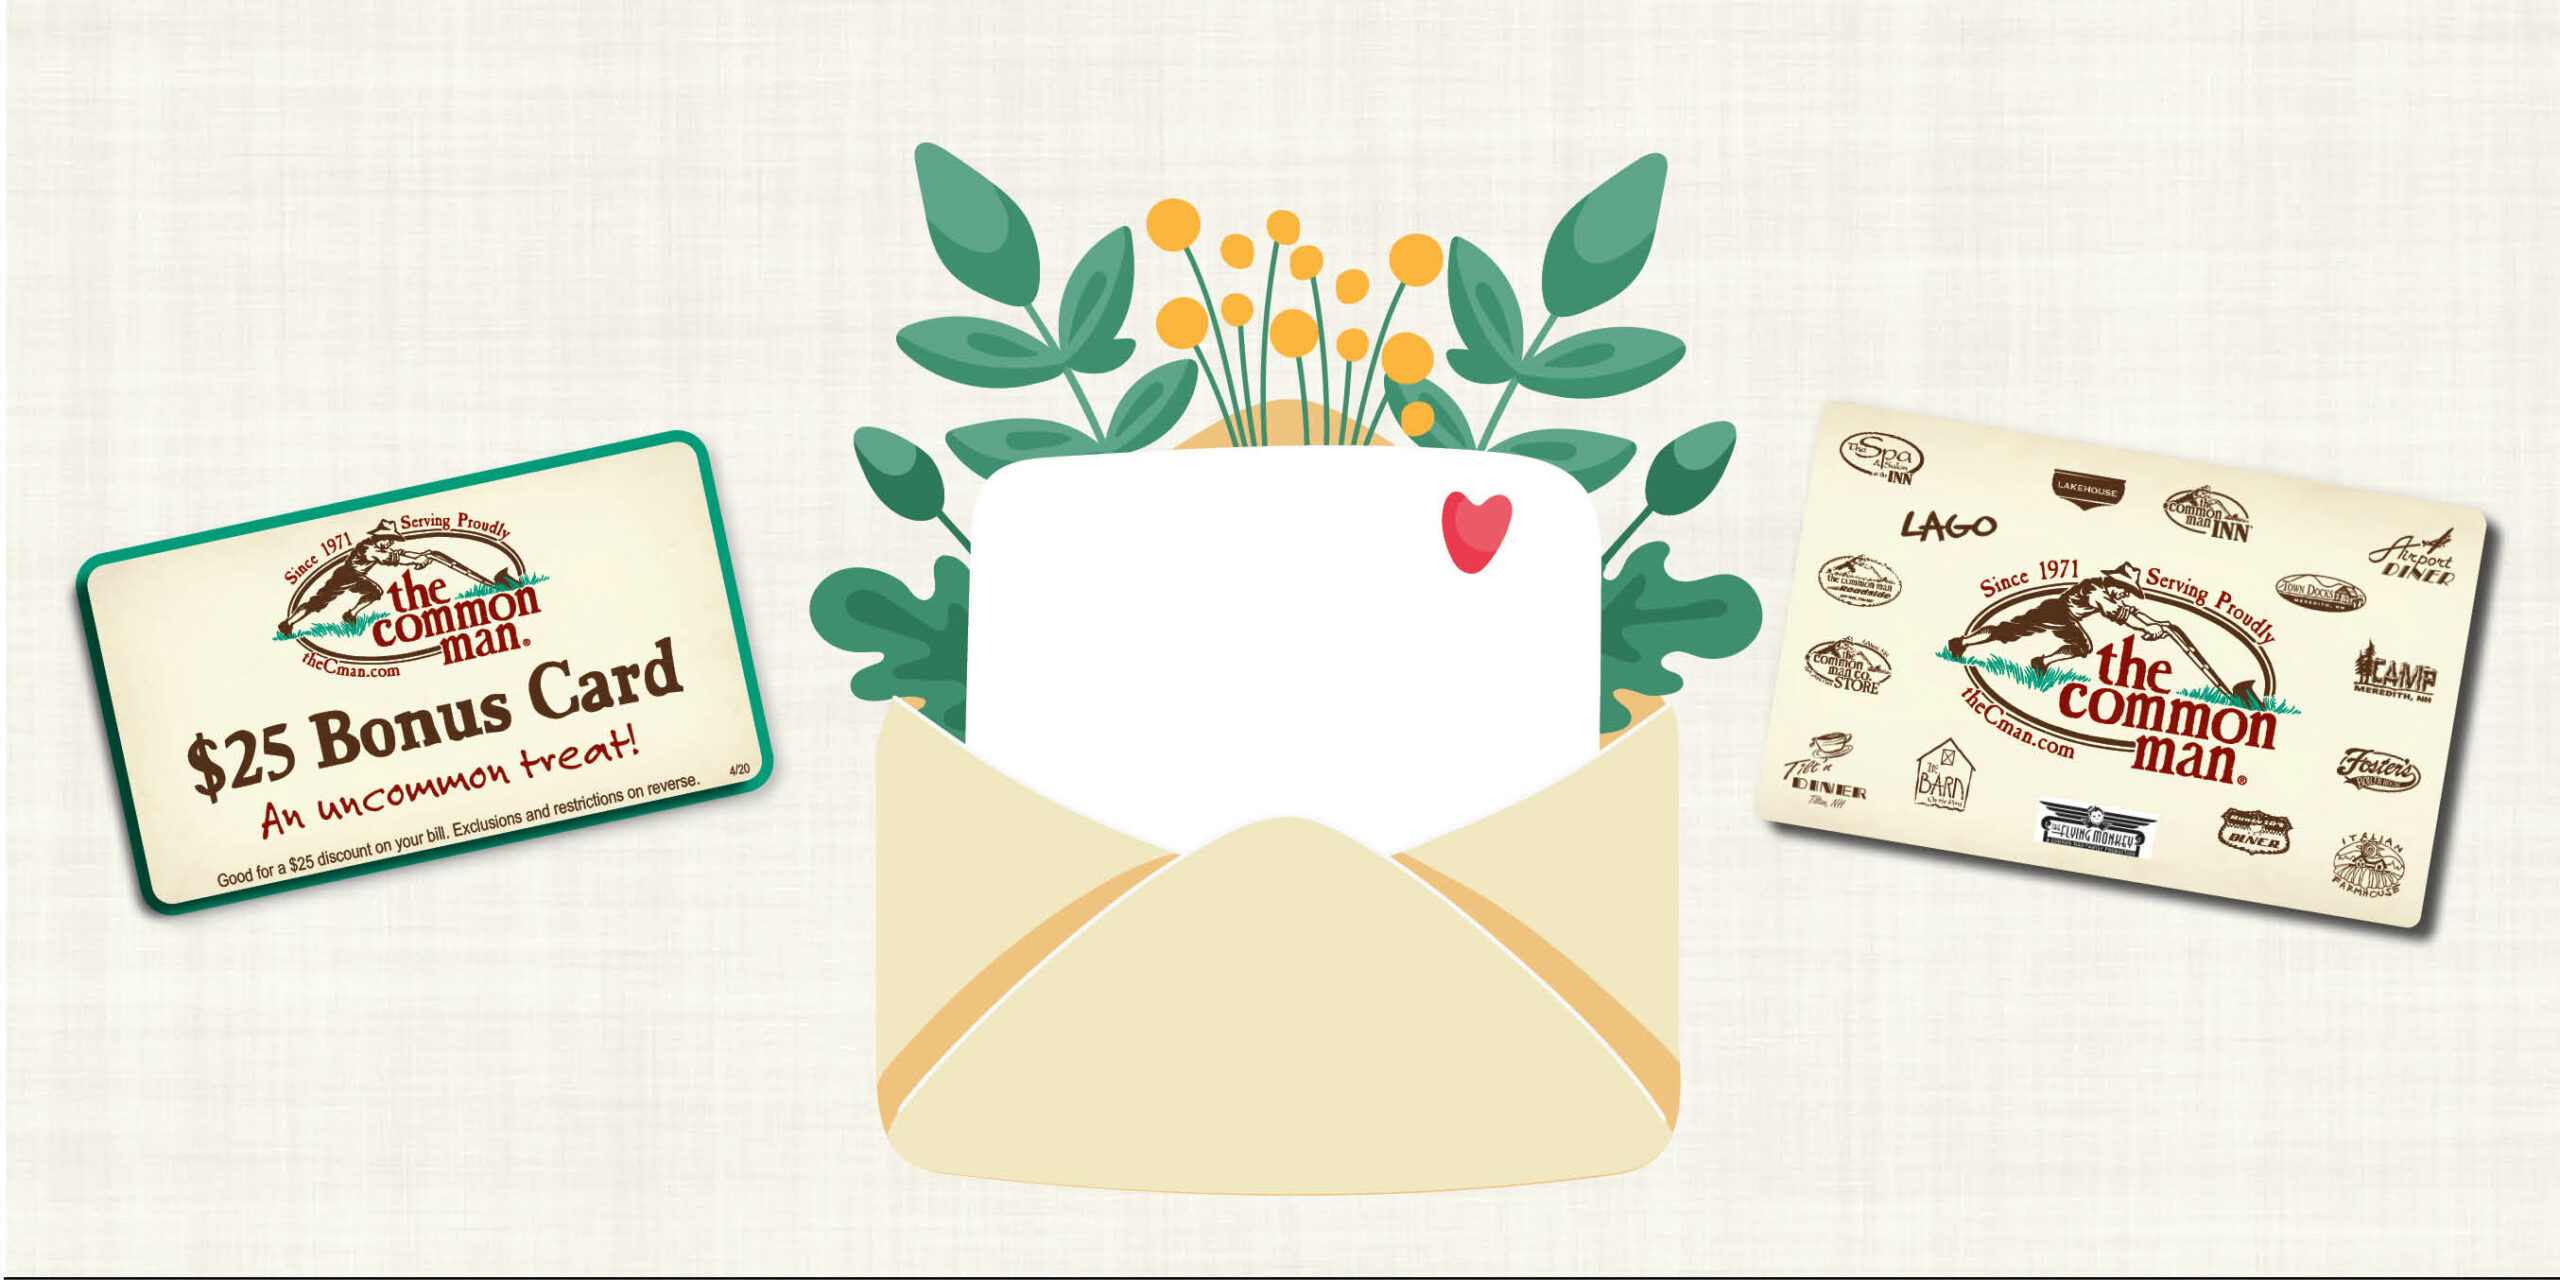 Mother's Day Bonus Card Promo